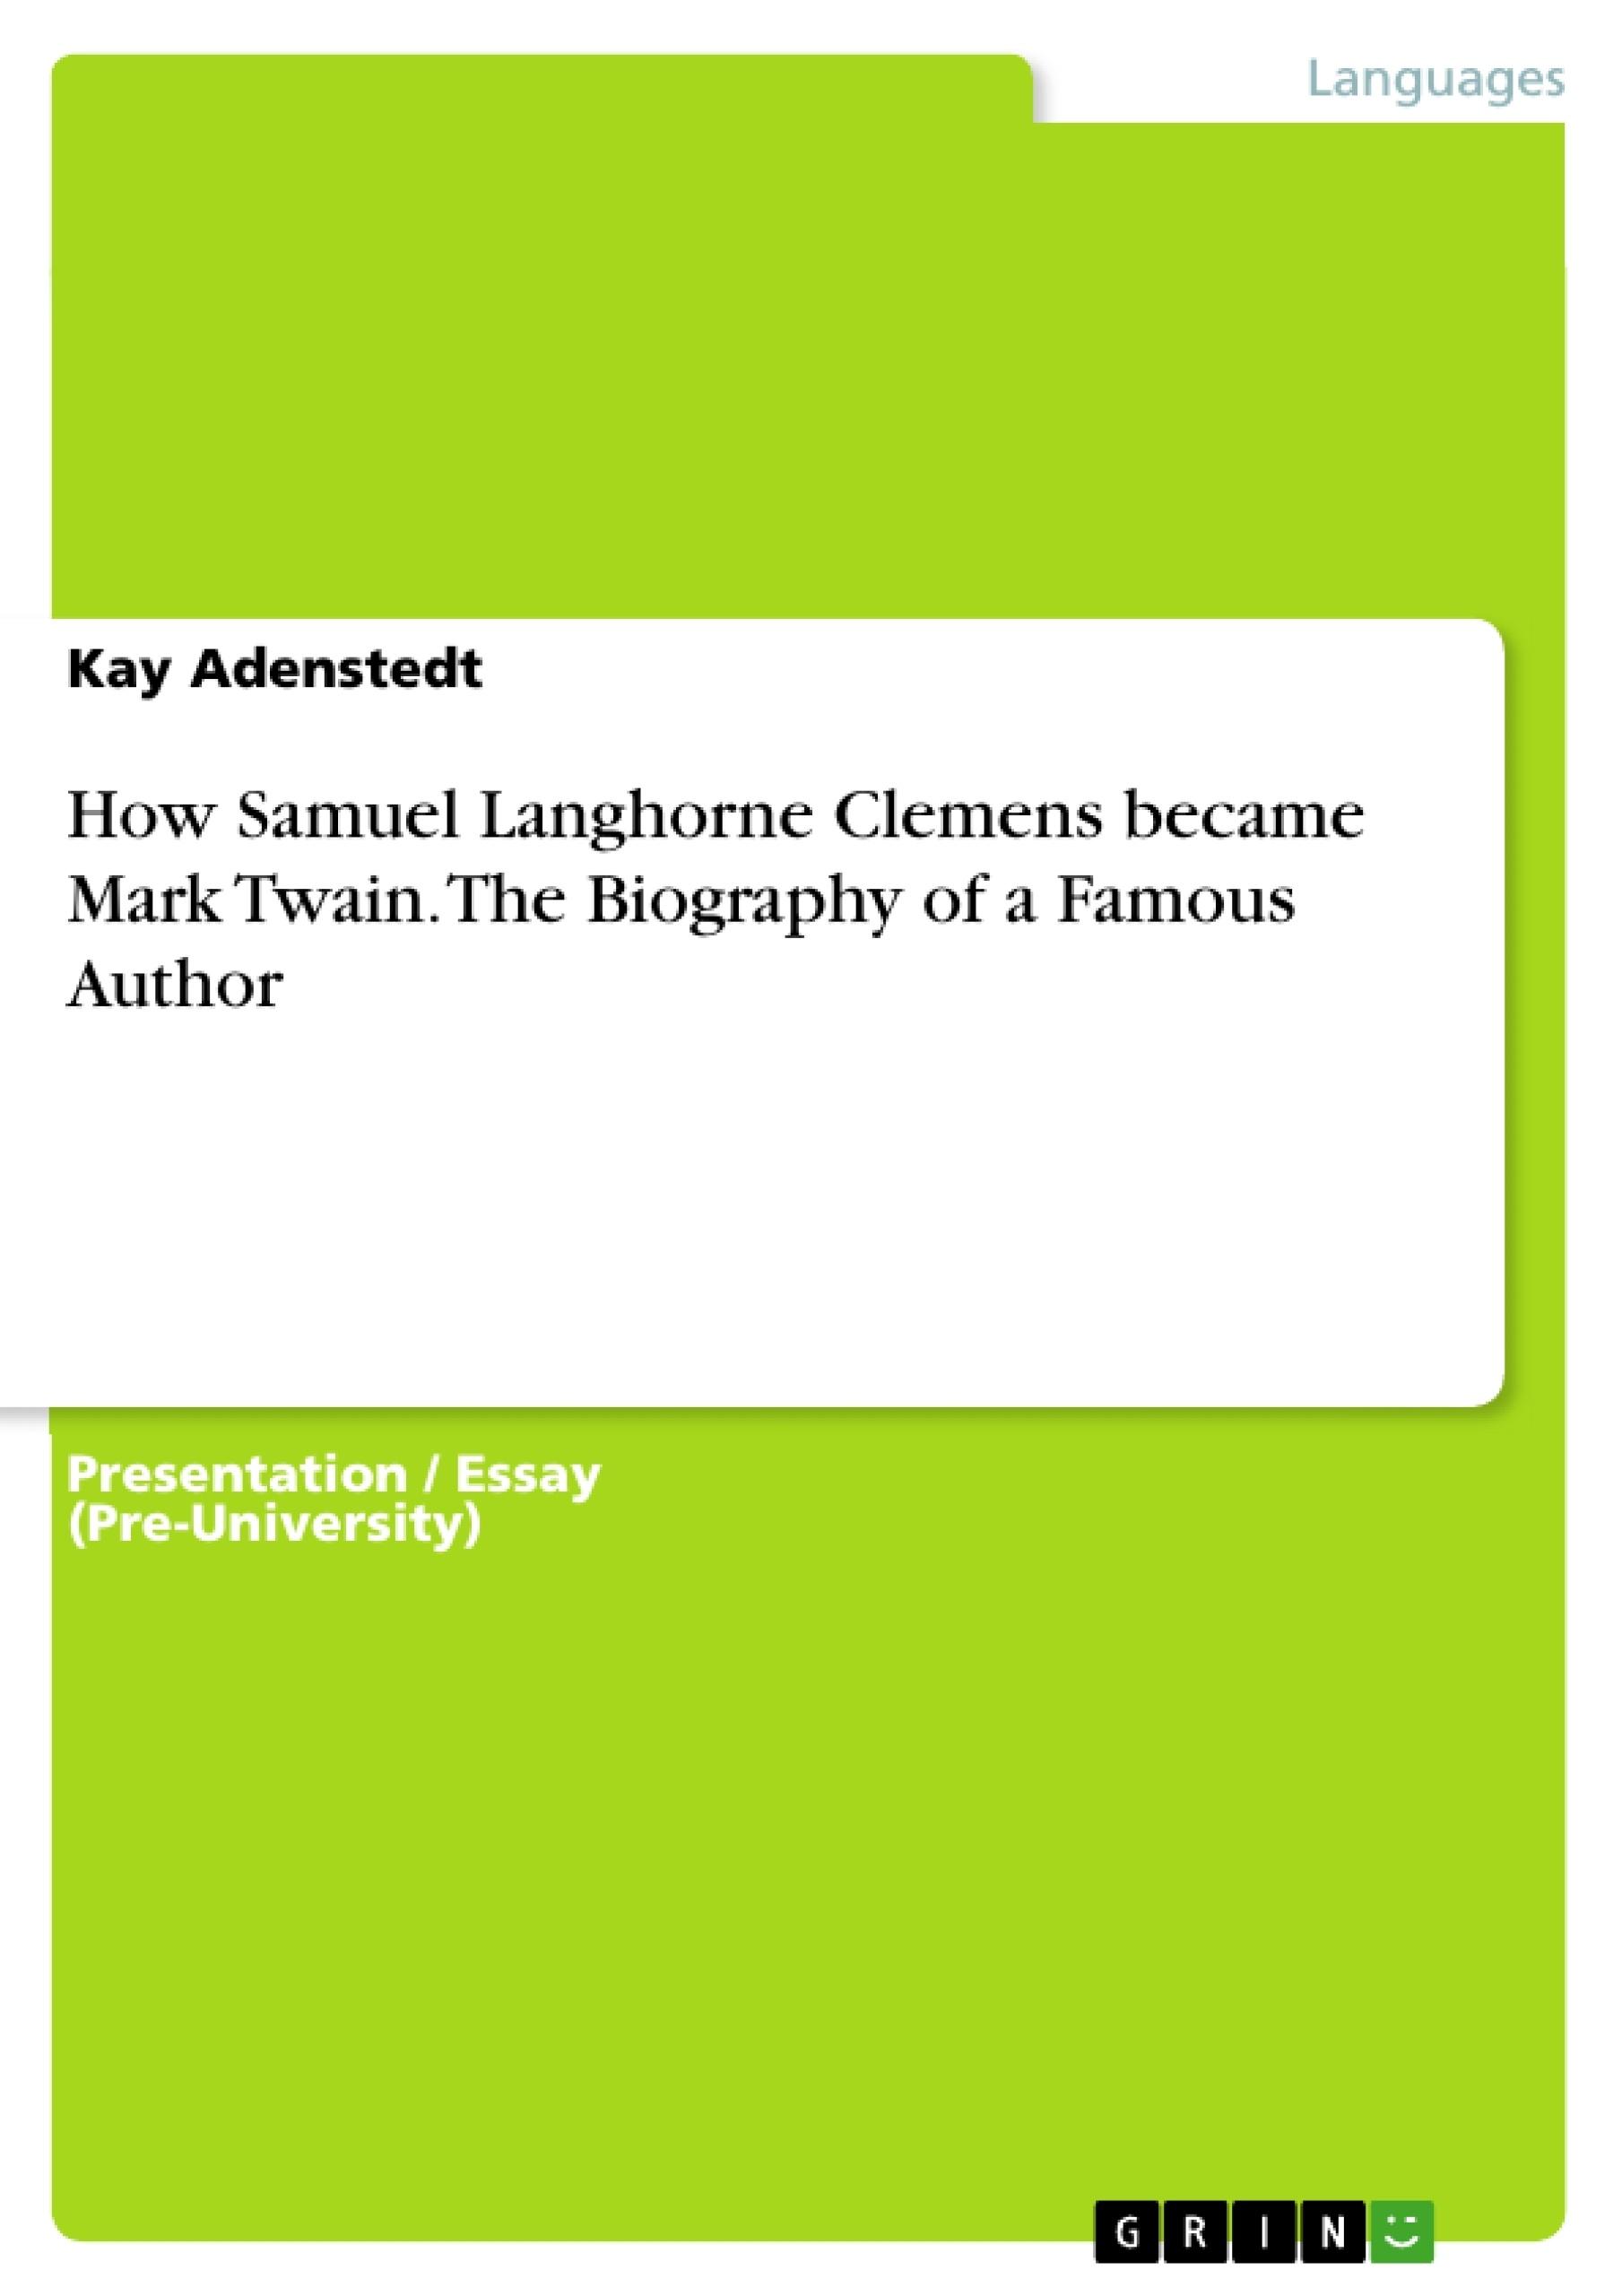 samuel langhorne clemens biography